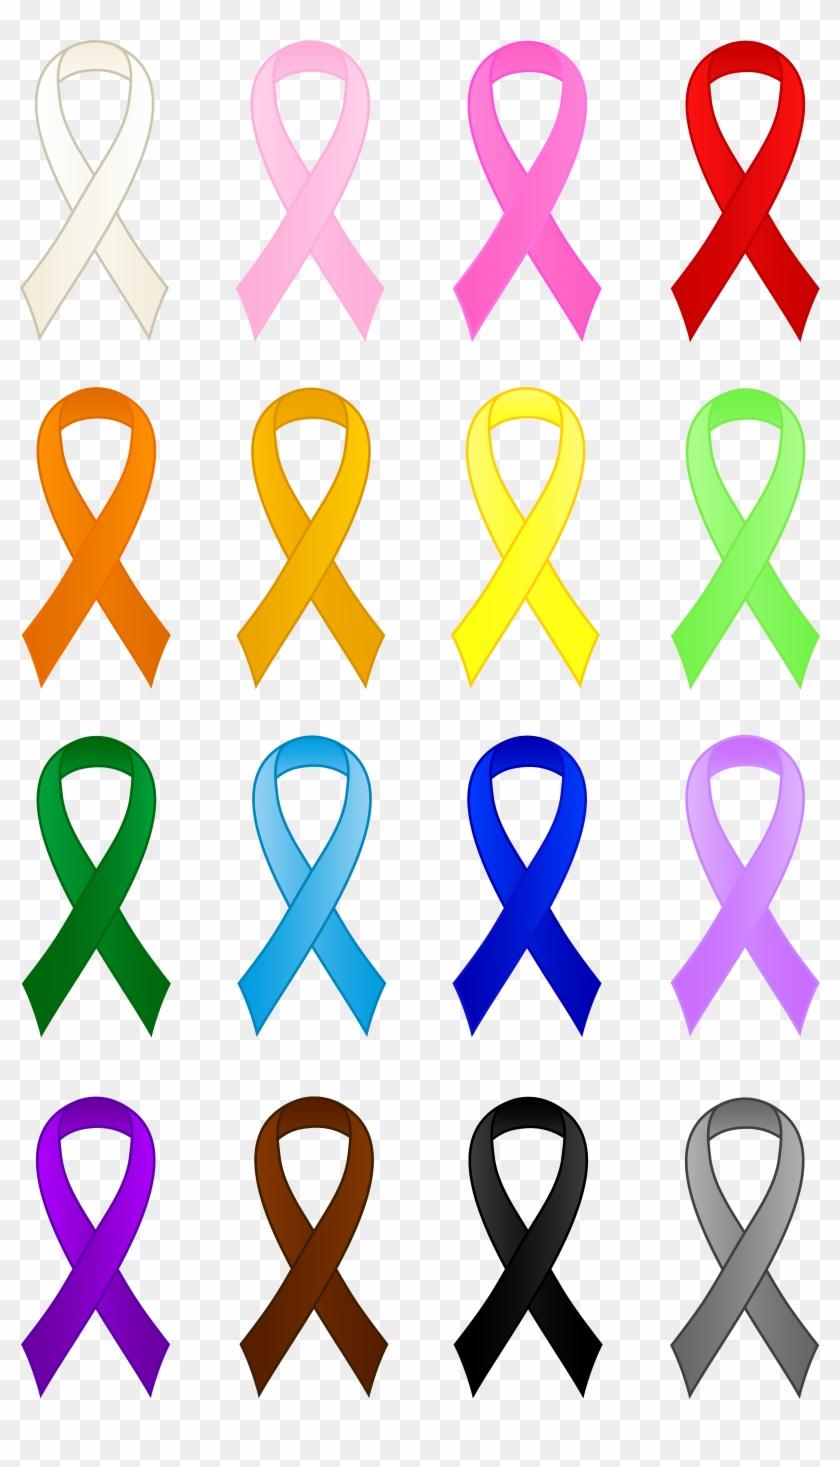 Cancer Awareness Ribbon Clip Art Techflourish Collections Cancer